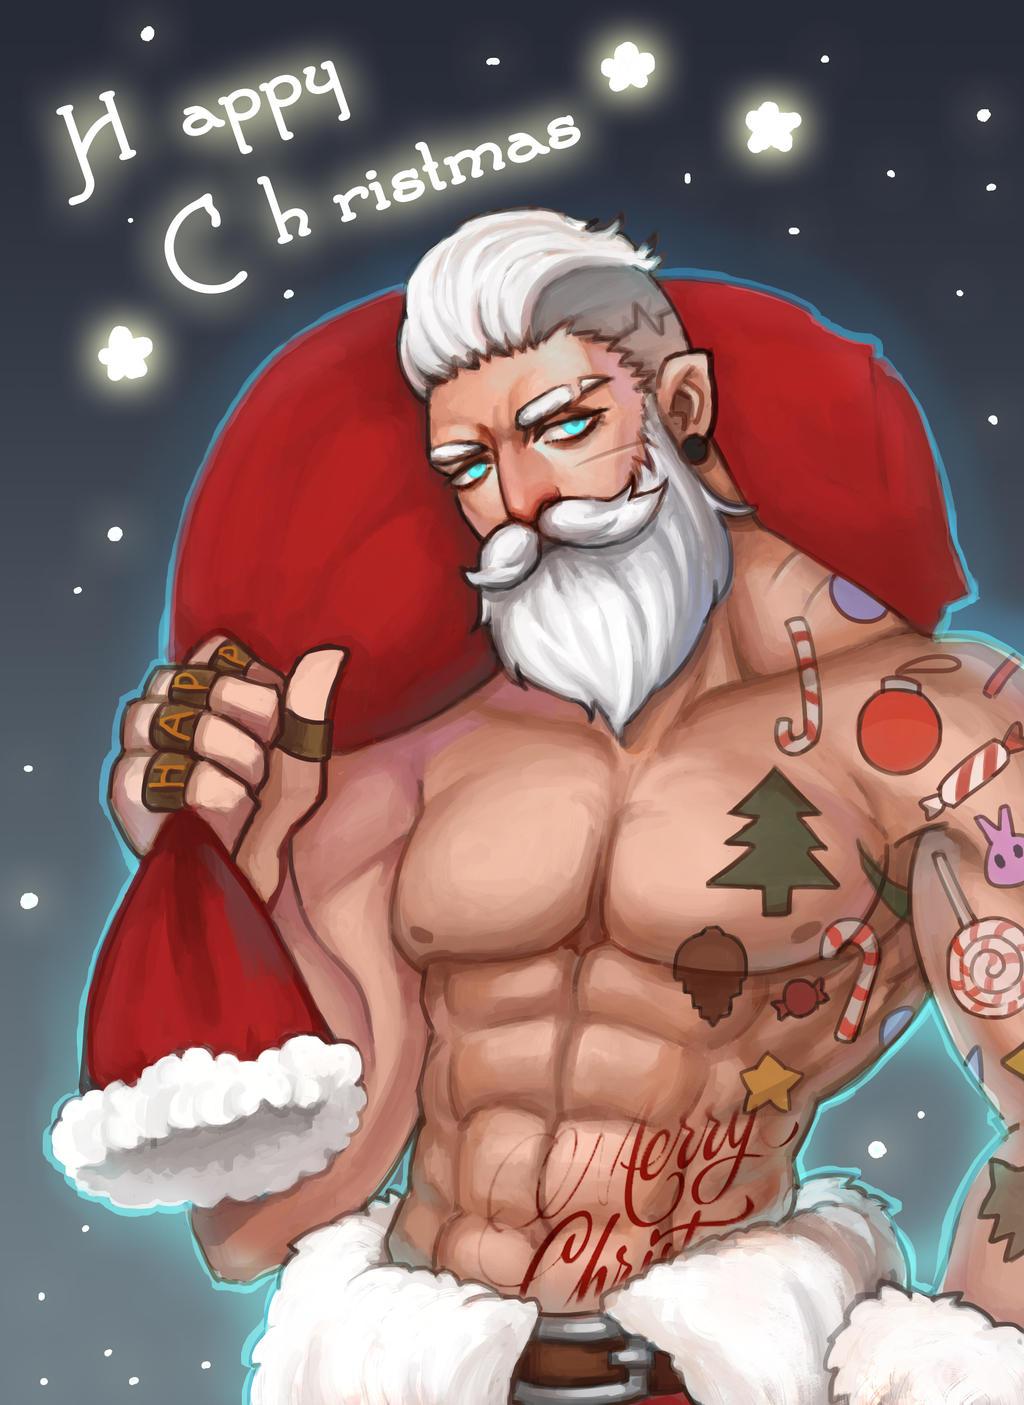 Merriest Christmas by MICE-KING on DeviantArt